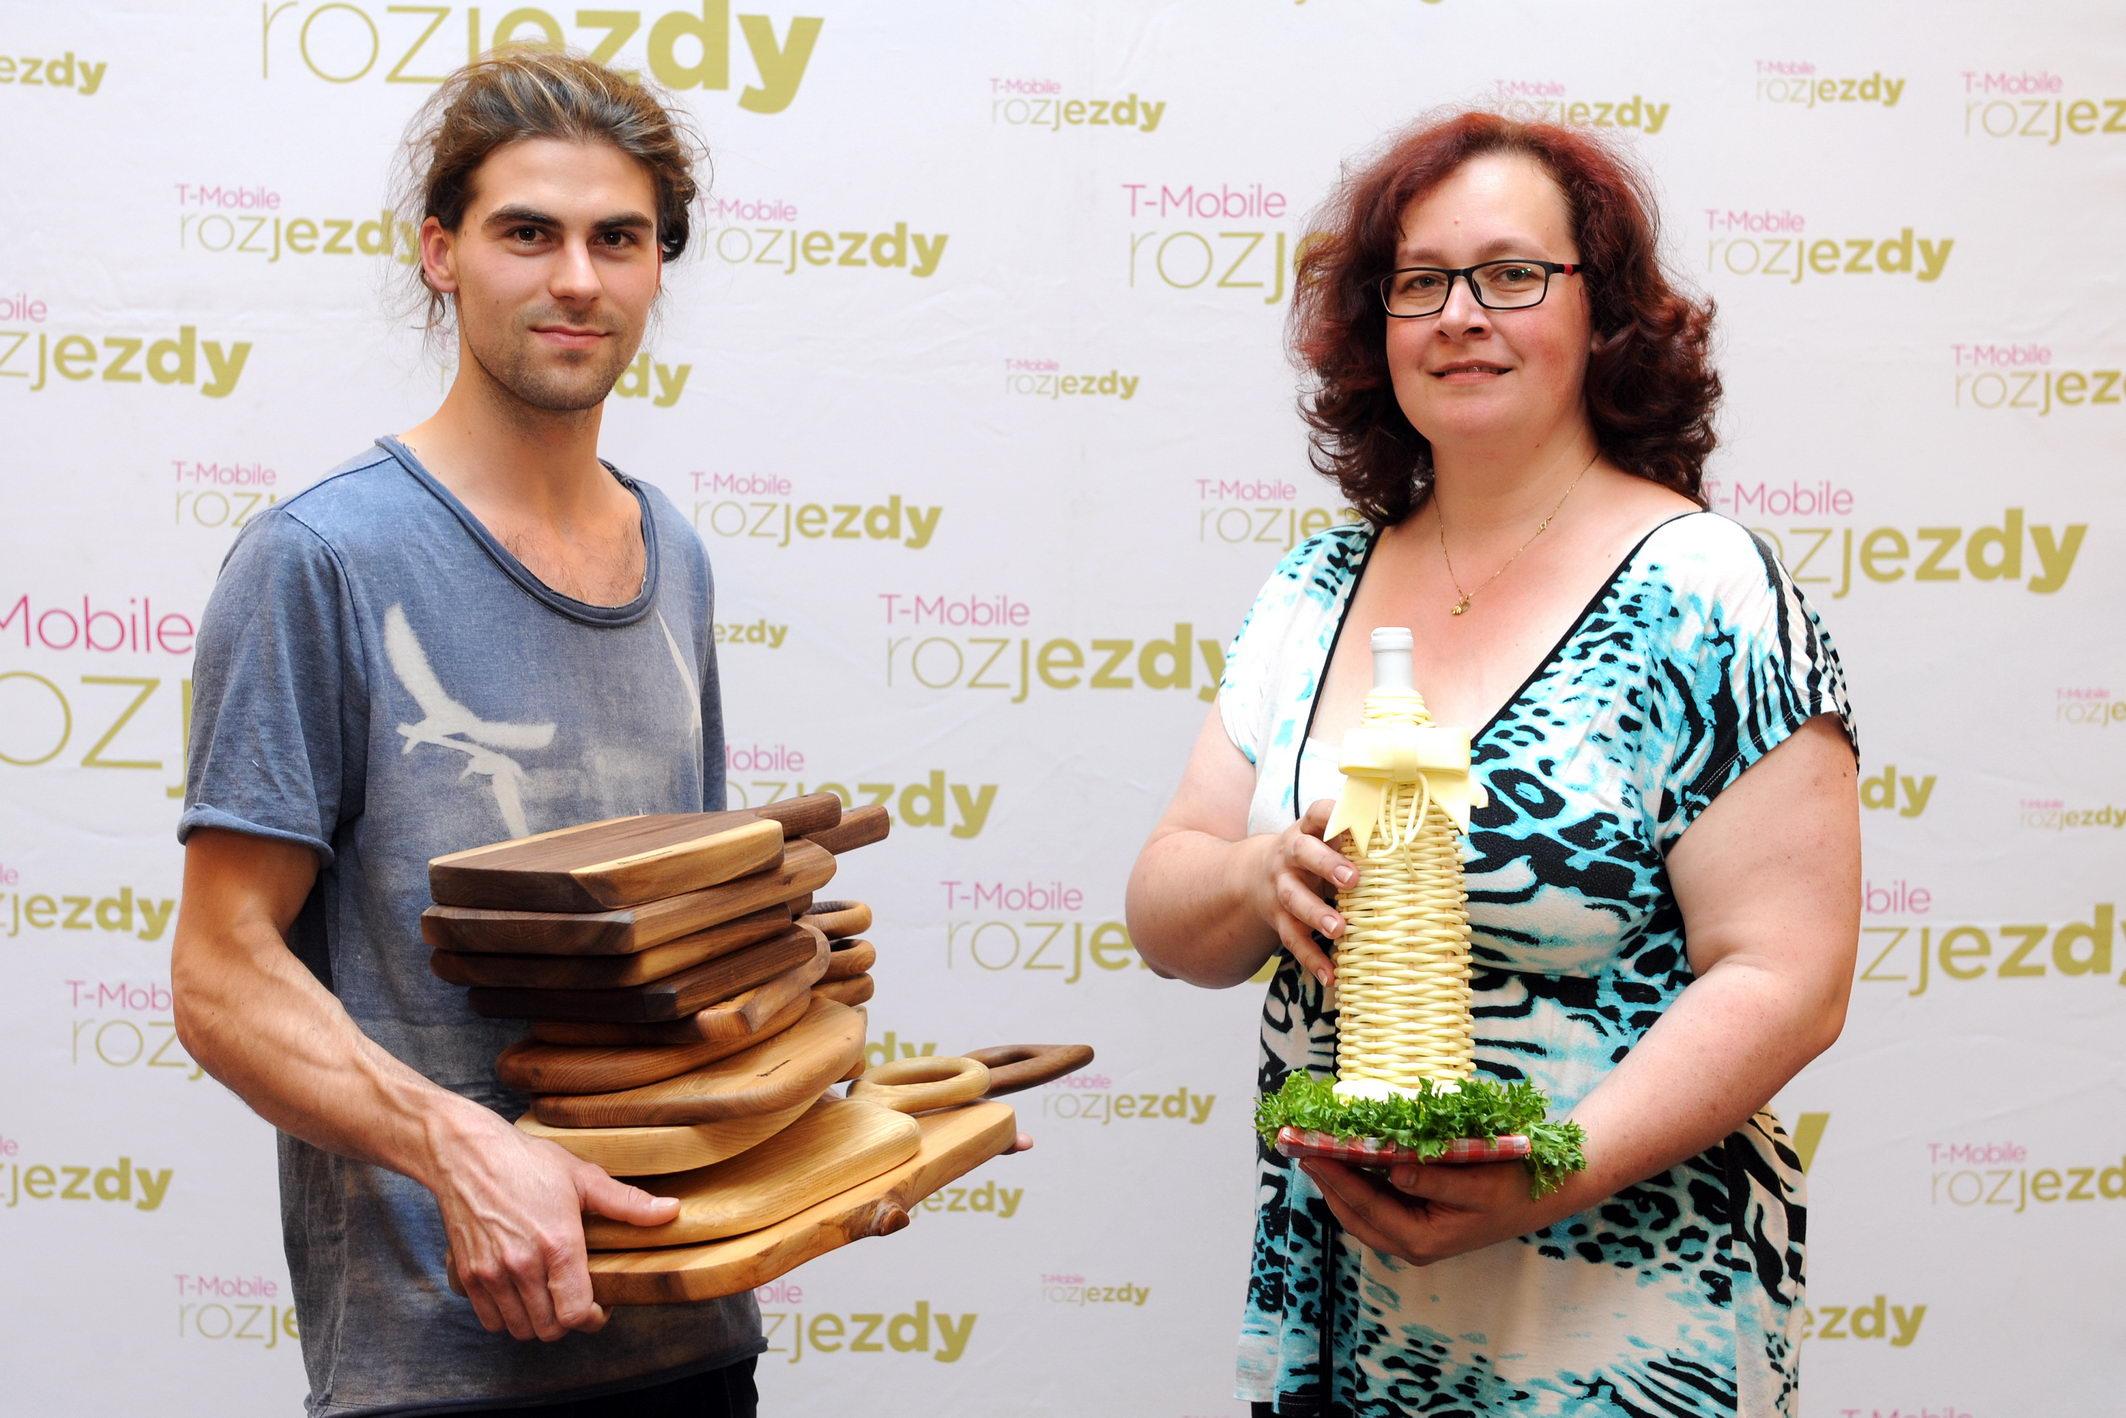 Rozjezdem roku se stala rodinná sýrárna Dančiny dobroty